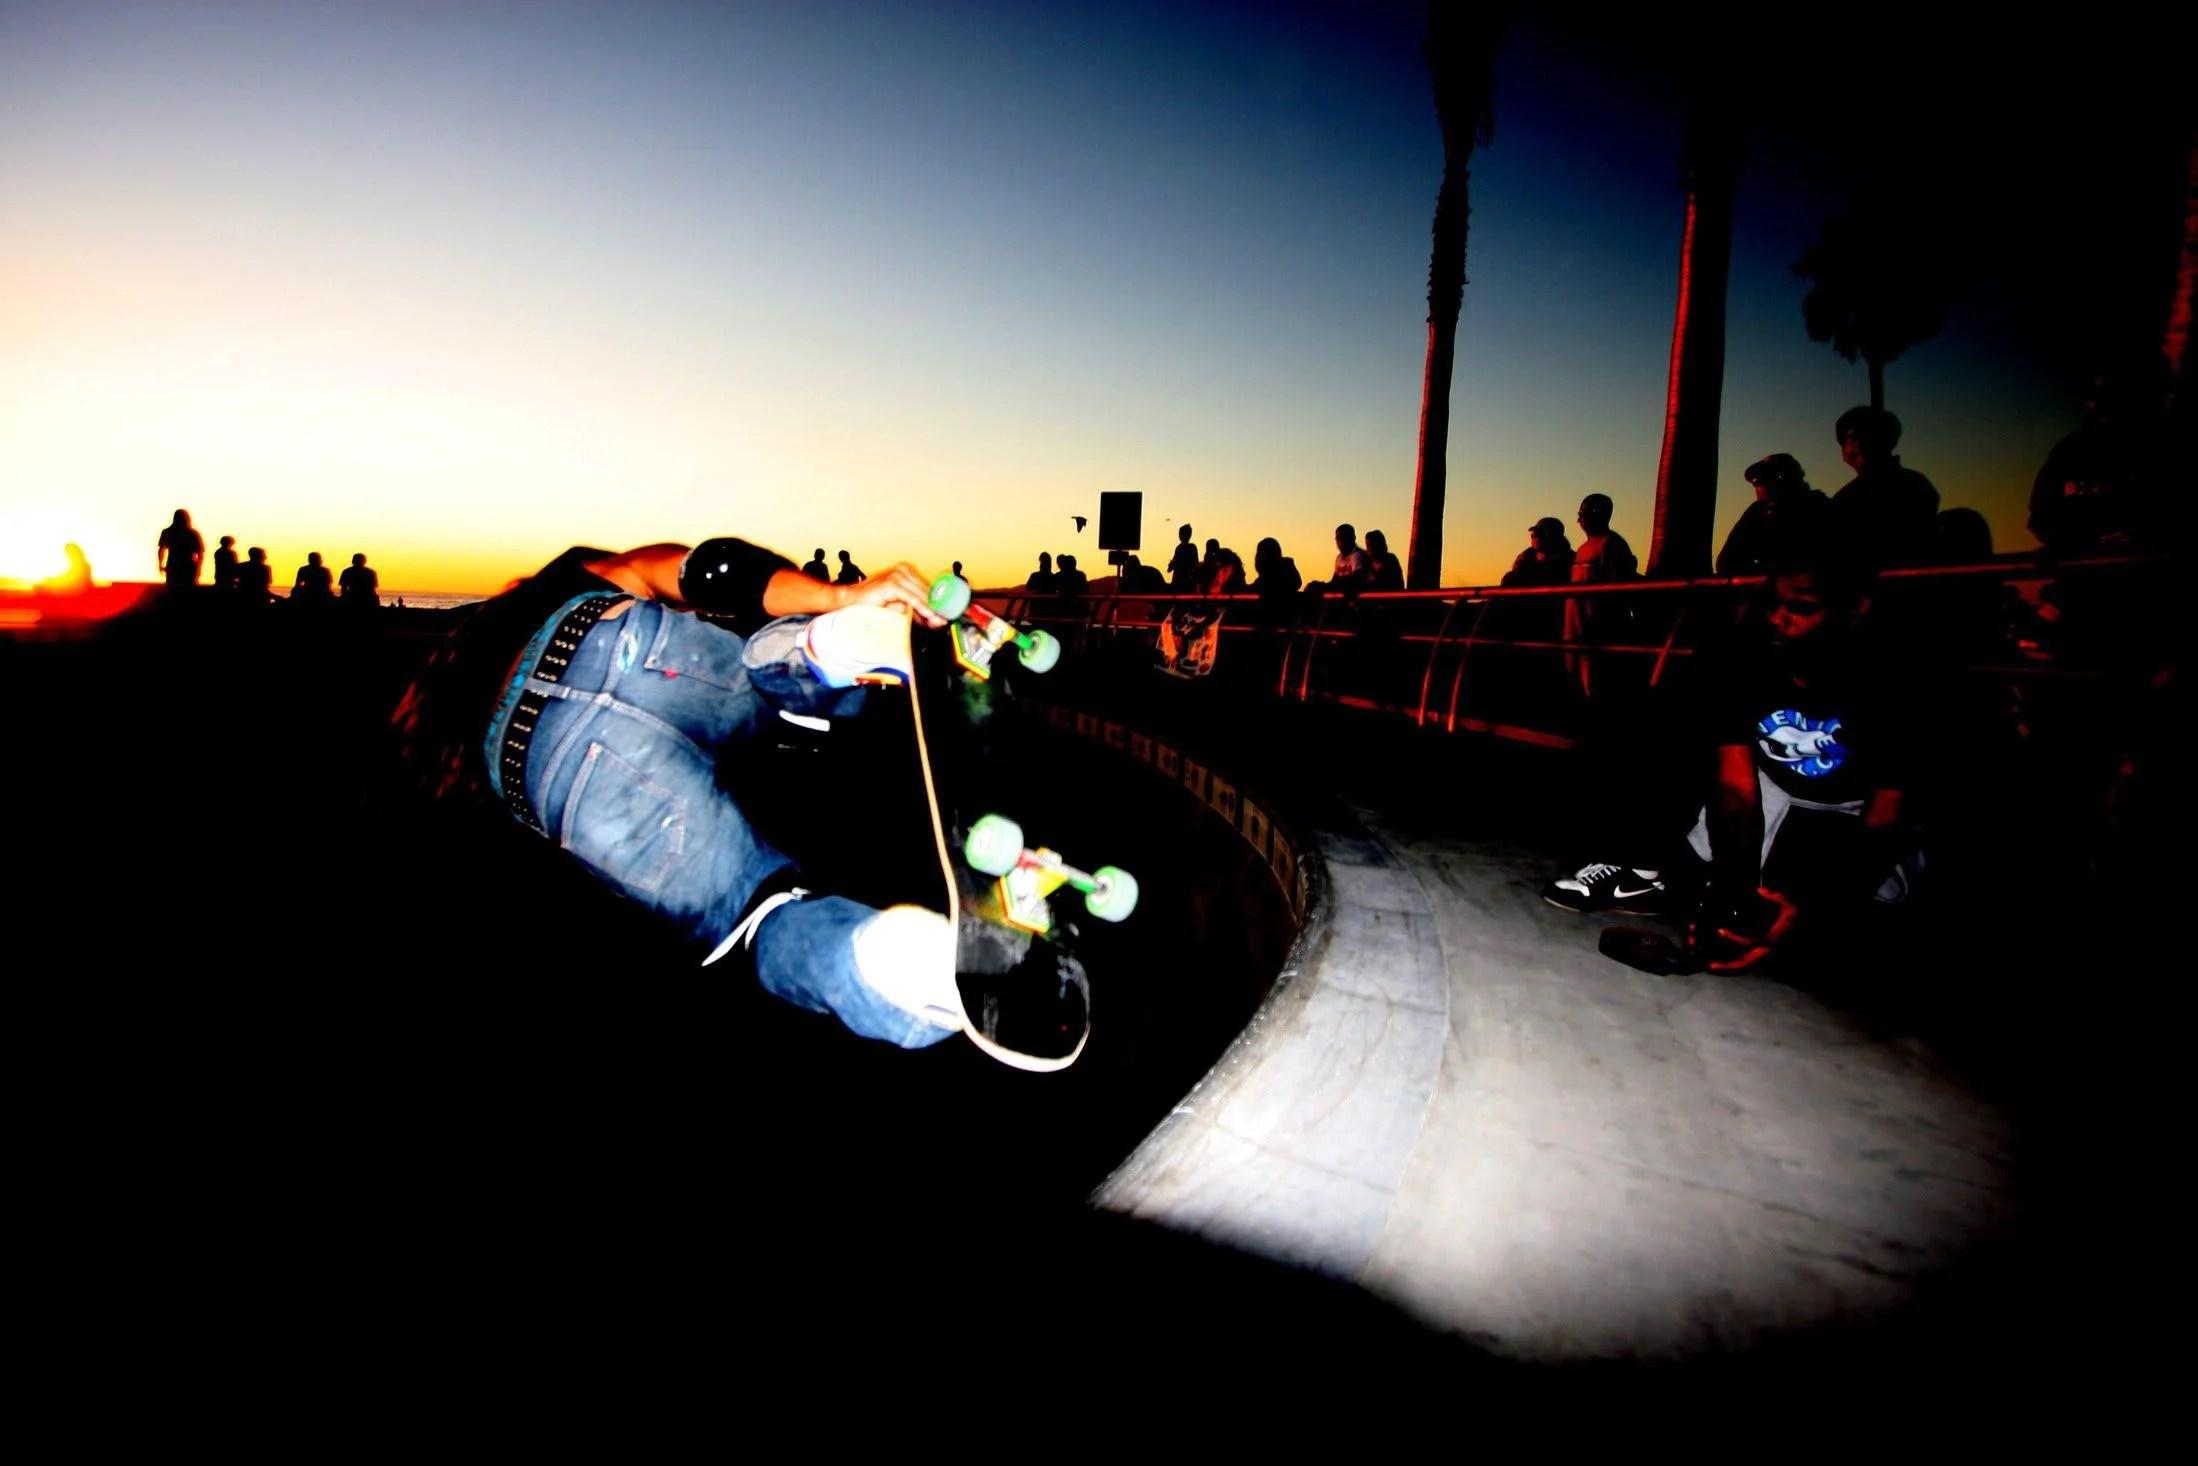 Girl Skateboards Wallpaper Hd Skateboard Wallpapers Wallpaper Cave